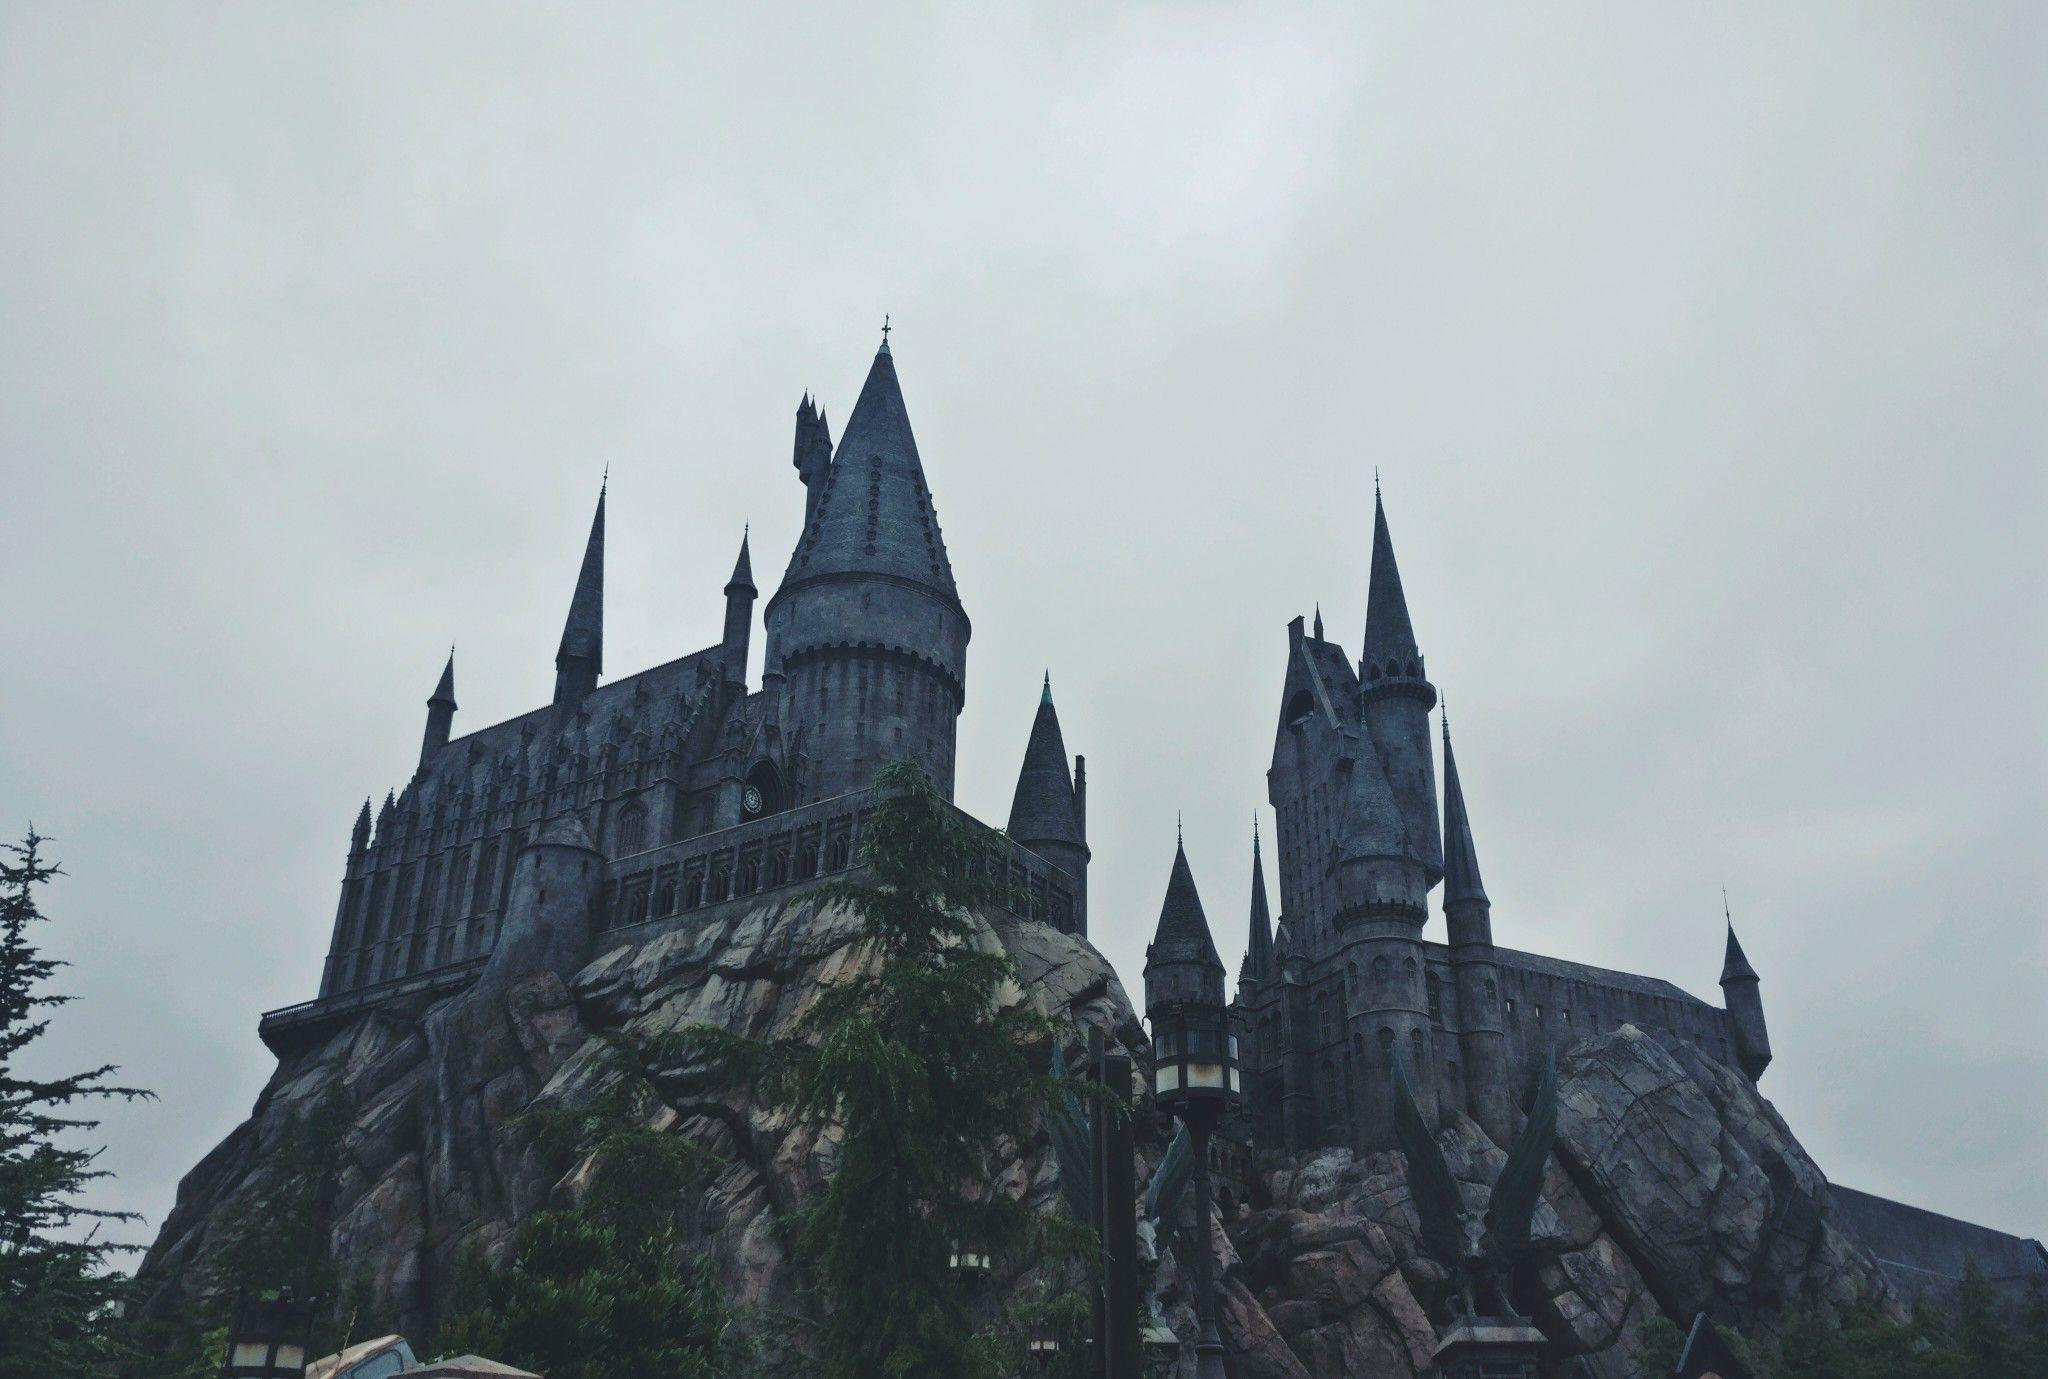 Harry Potter Universal Studios Hollywood Harry Potter Universal Studios Hollywood Harry Potter Universal Studios Universal Studios Hollywood